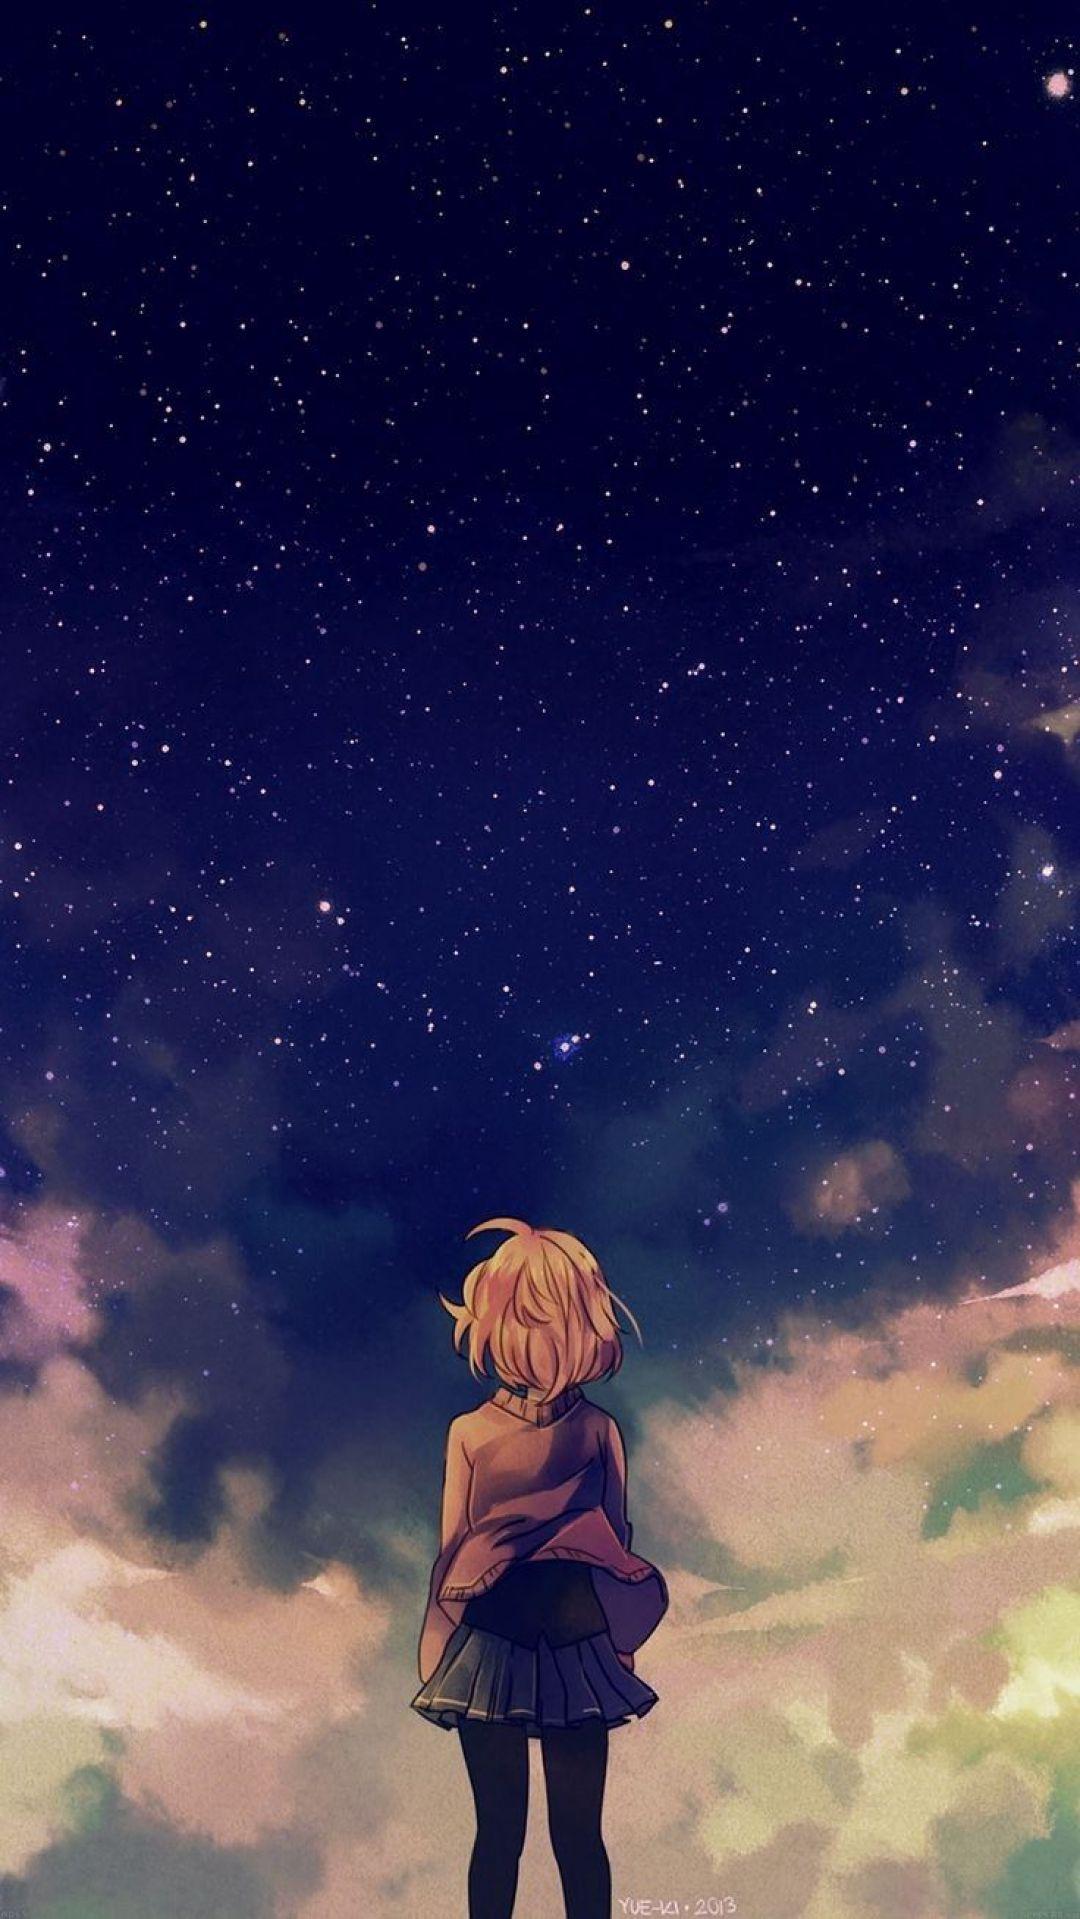 Free Download 35 Pastel Aesthetic Anime Hd Wallpapers Desktop